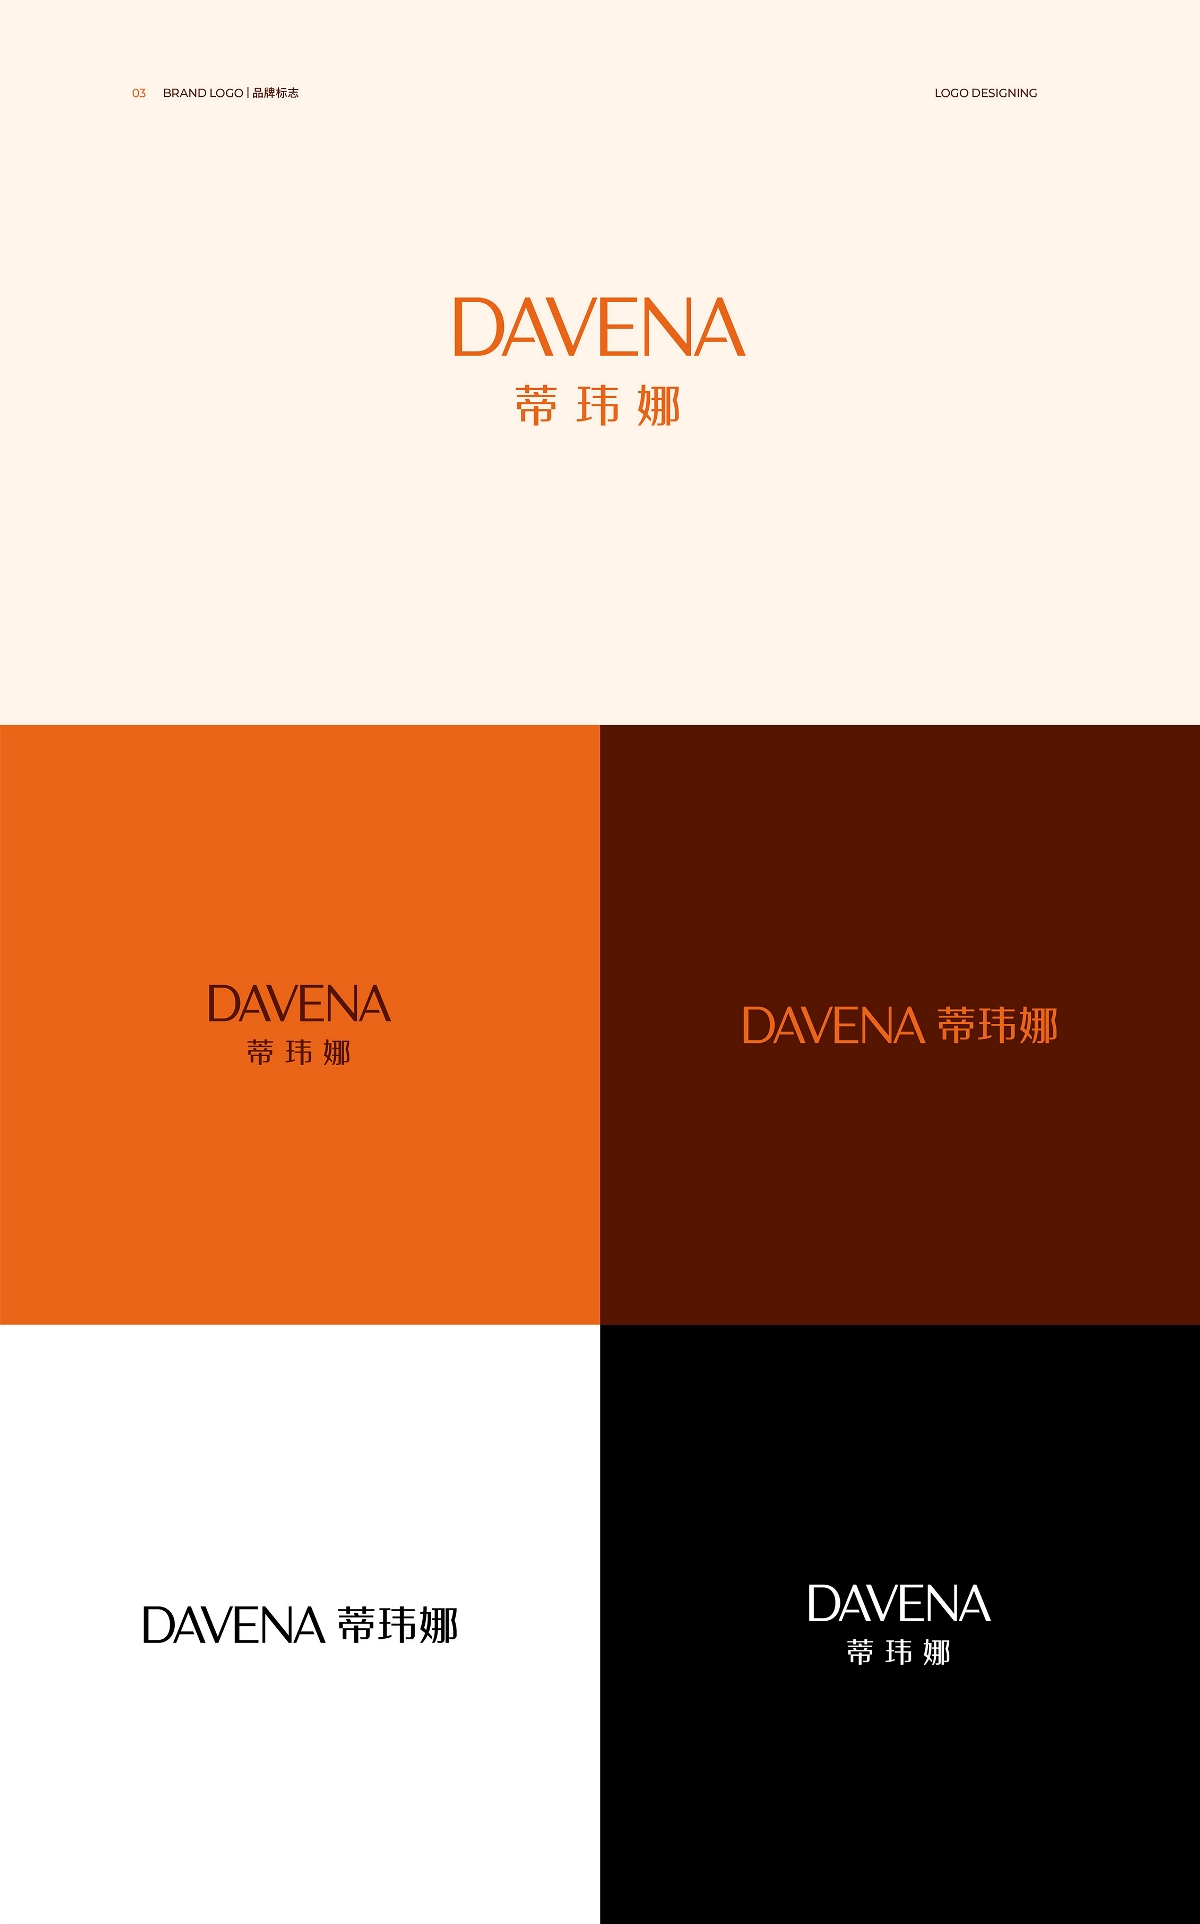 DAVENA | 蒂玮娜手表品牌VI设计 by 心铭舍